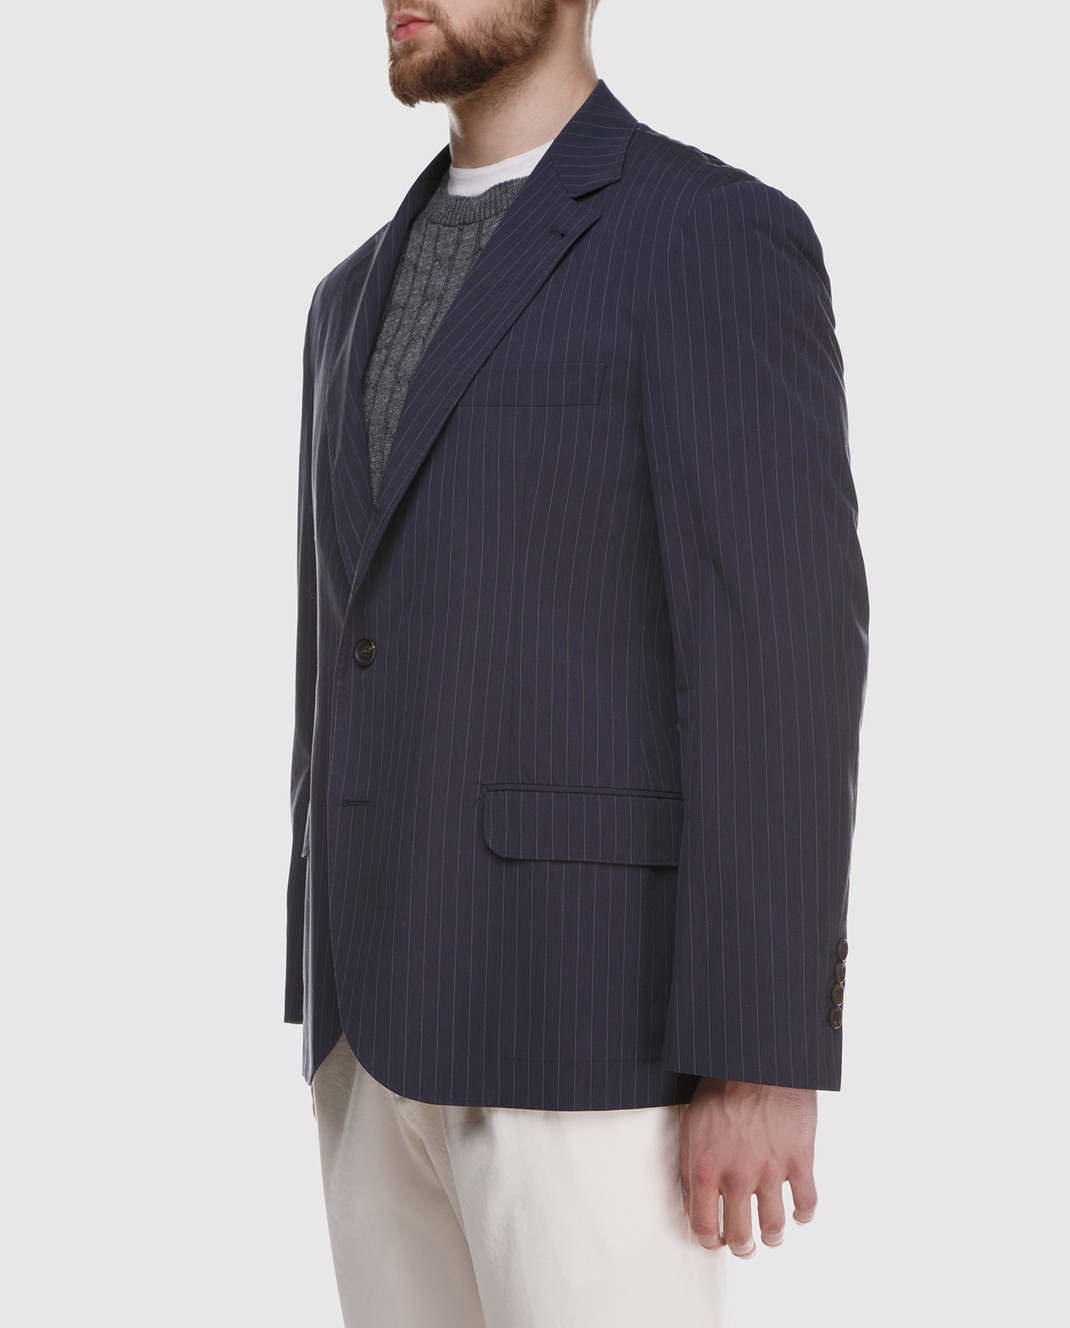 Brunello Cucinelli Синий пиджак MD4037BTD изображение 3